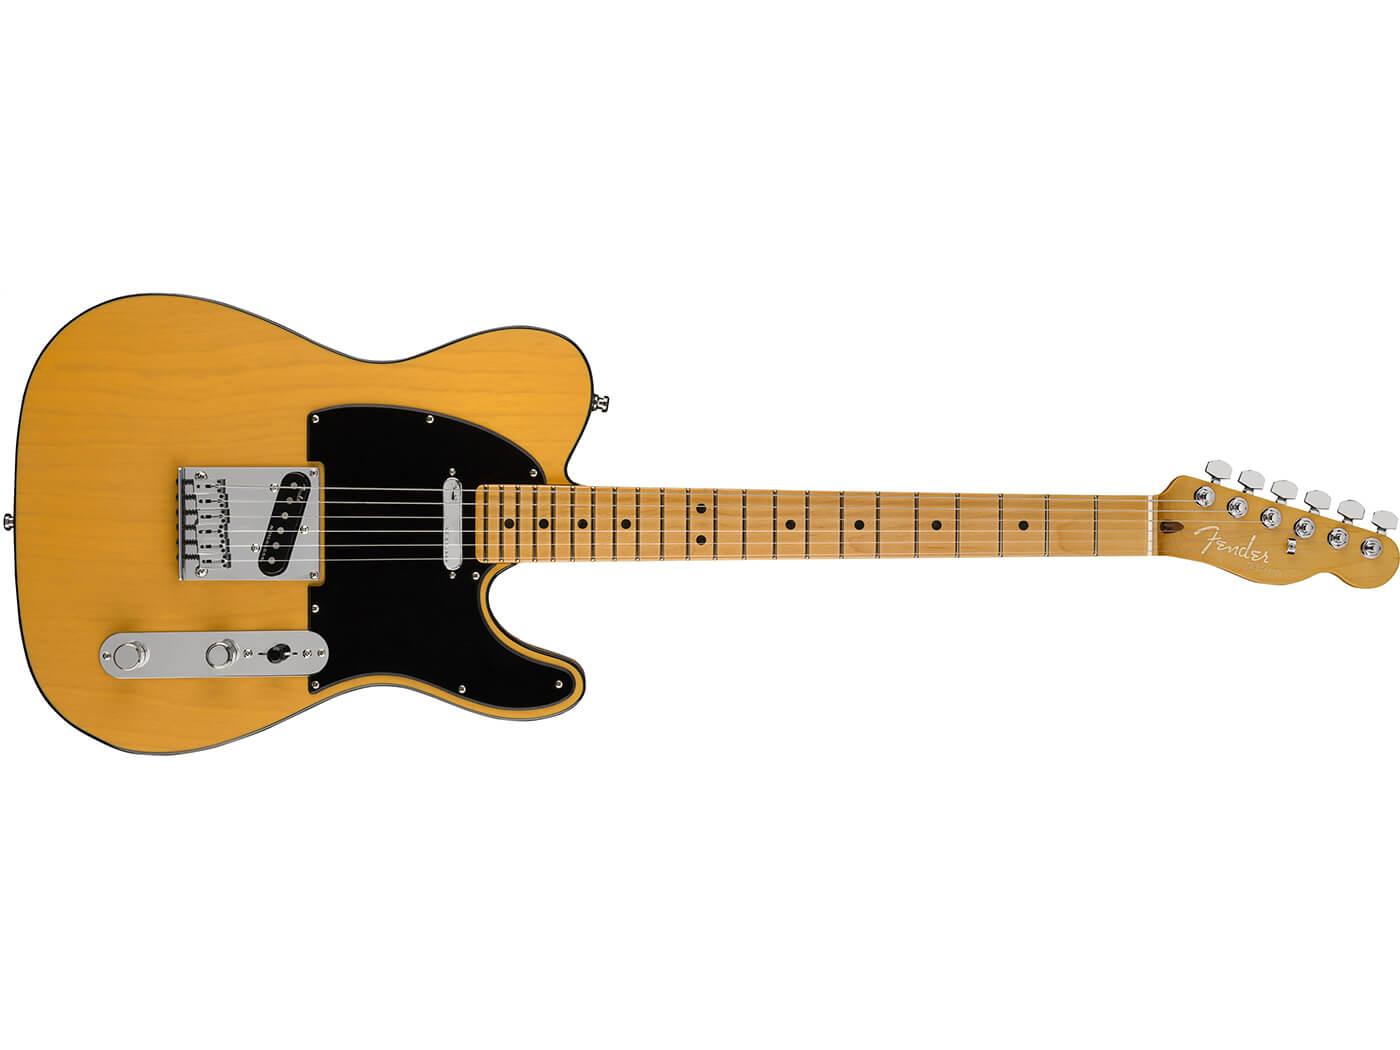 Fender American Telecaster (Butterscotch Blonde)